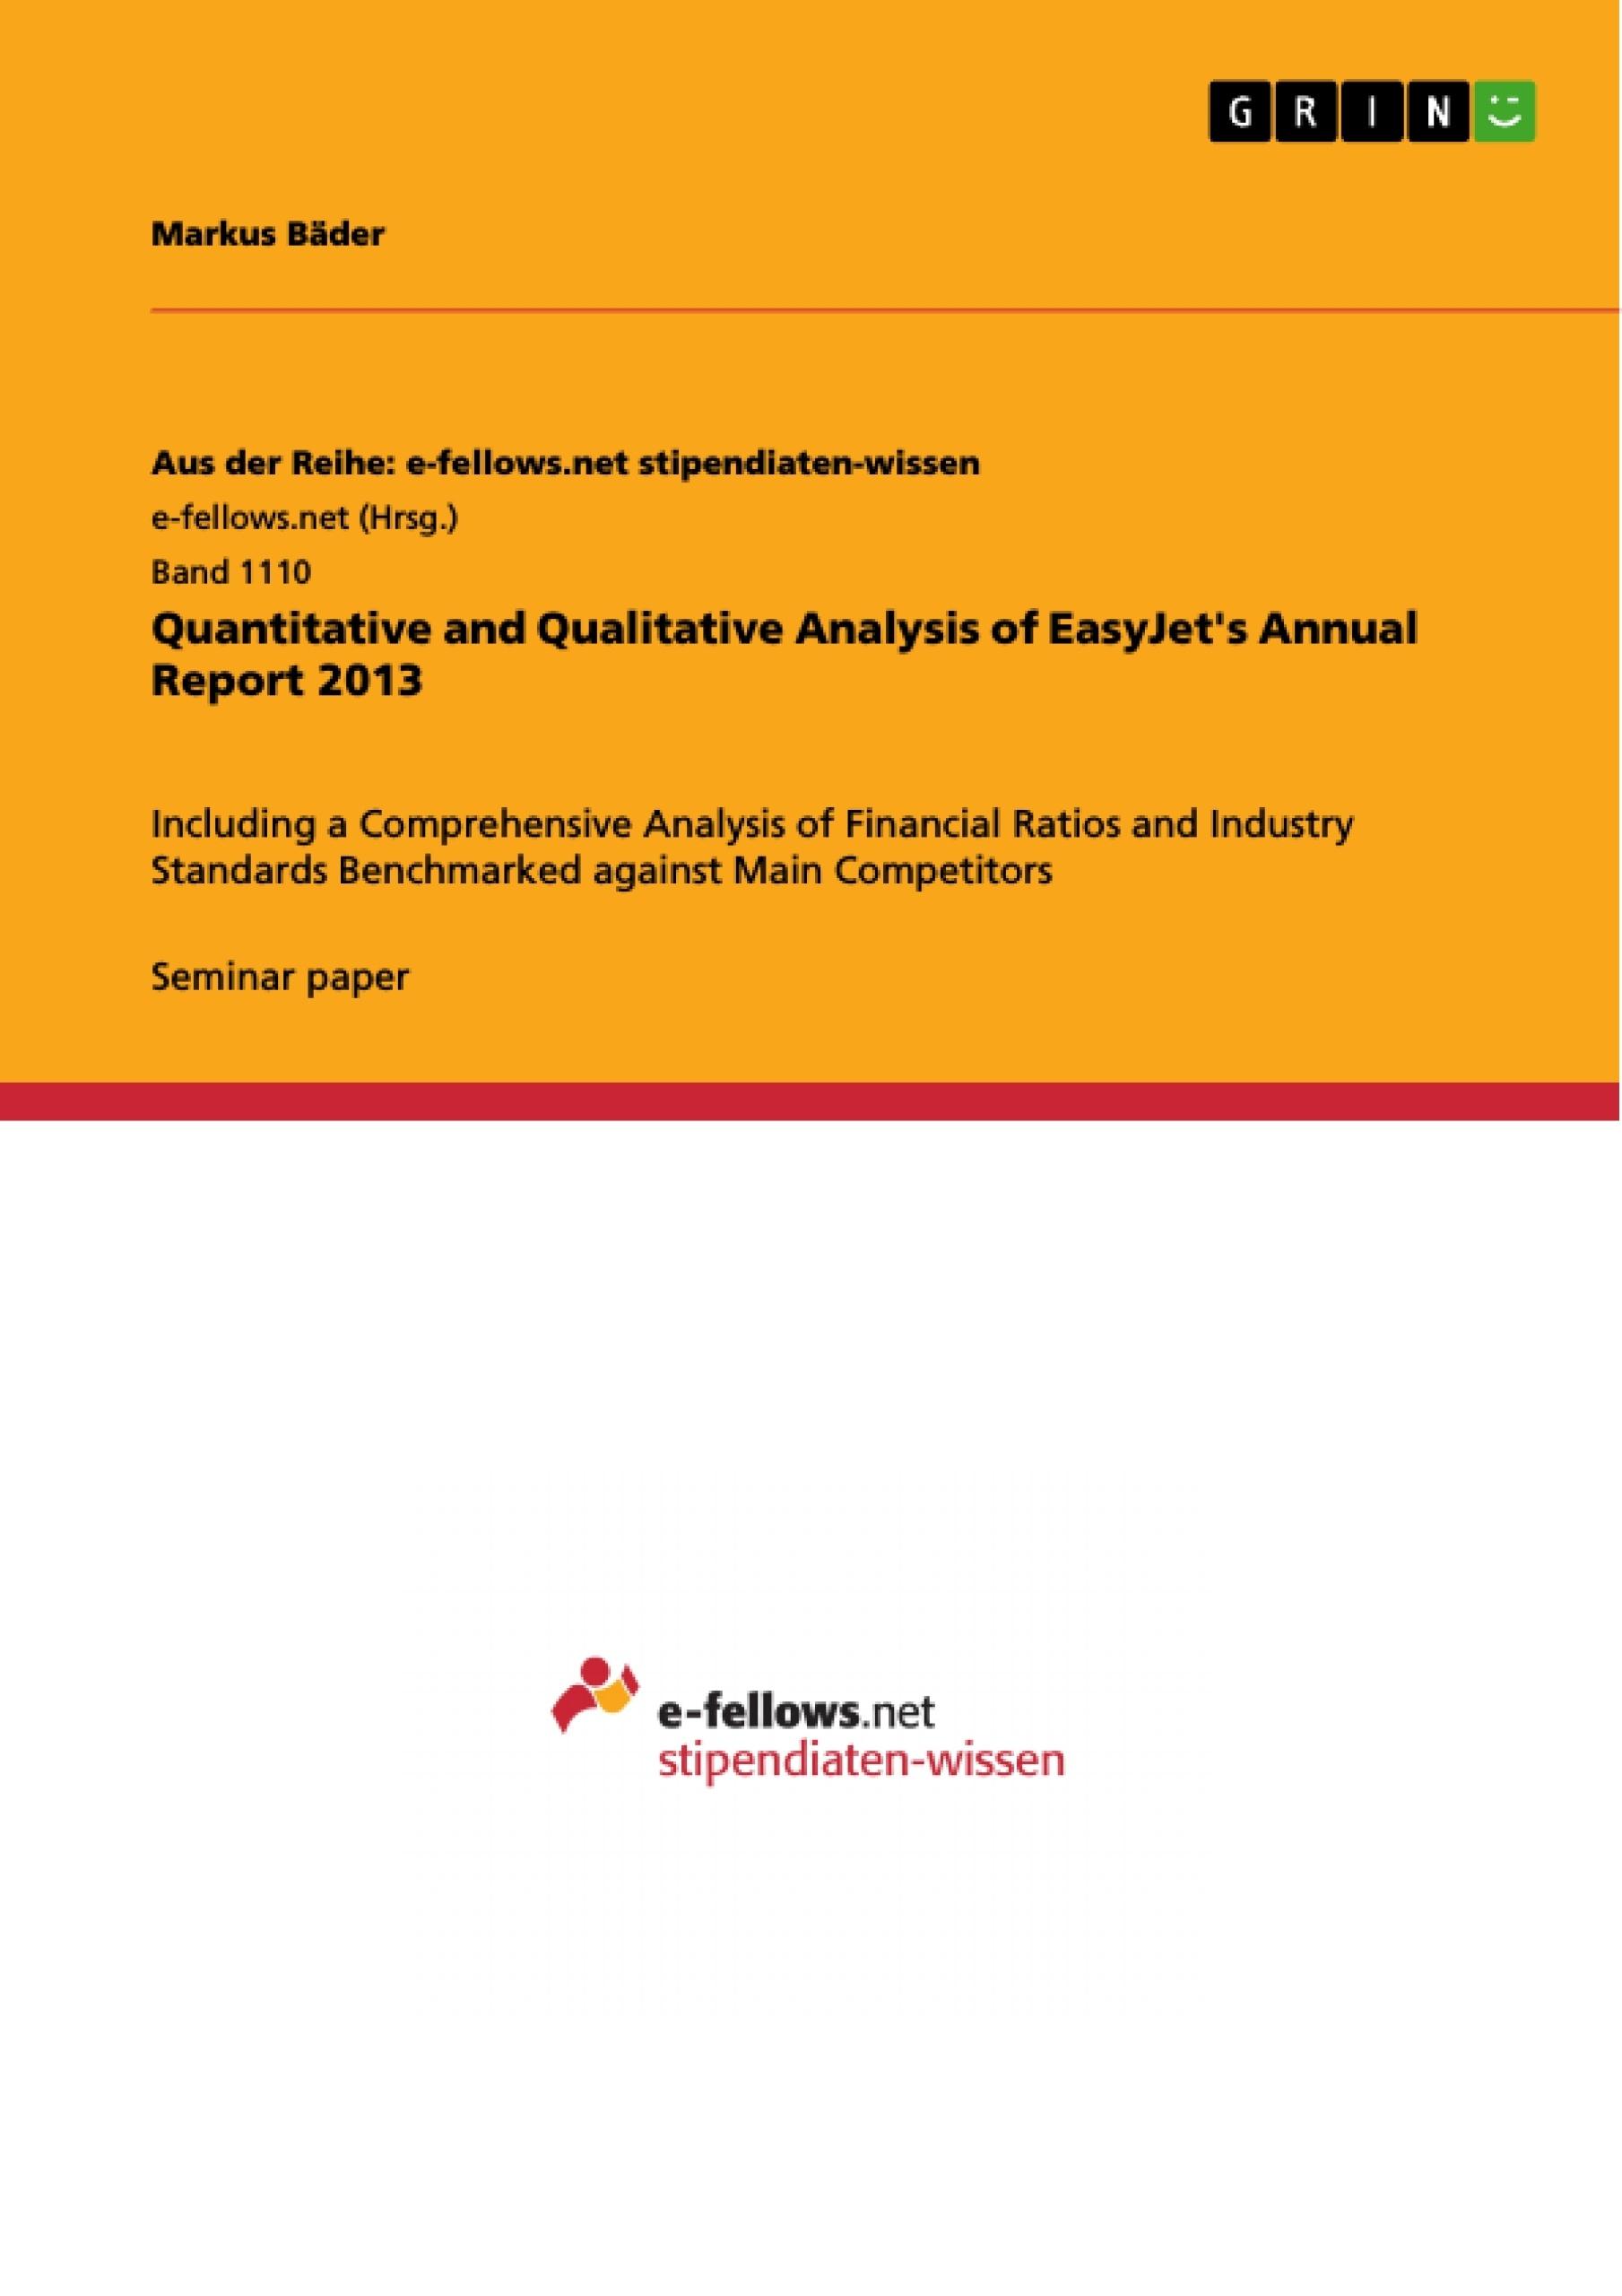 Title: Quantitative and Qualitative Analysis of EasyJet's Annual Report 2013